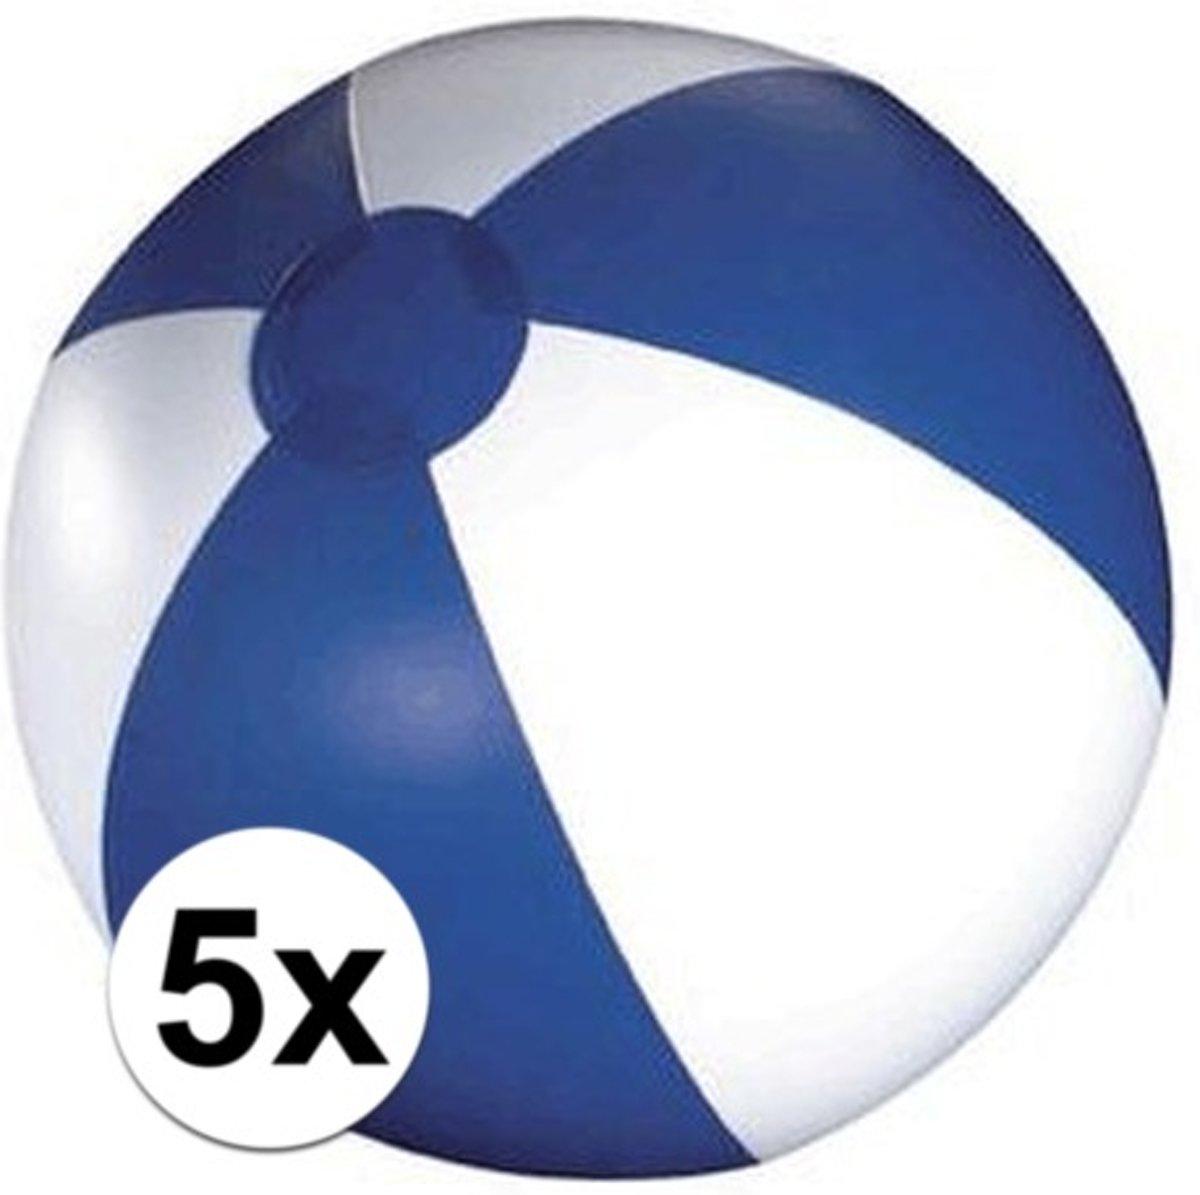 5x Opblaasbare strandbal blauw - 30 cm - strandballen